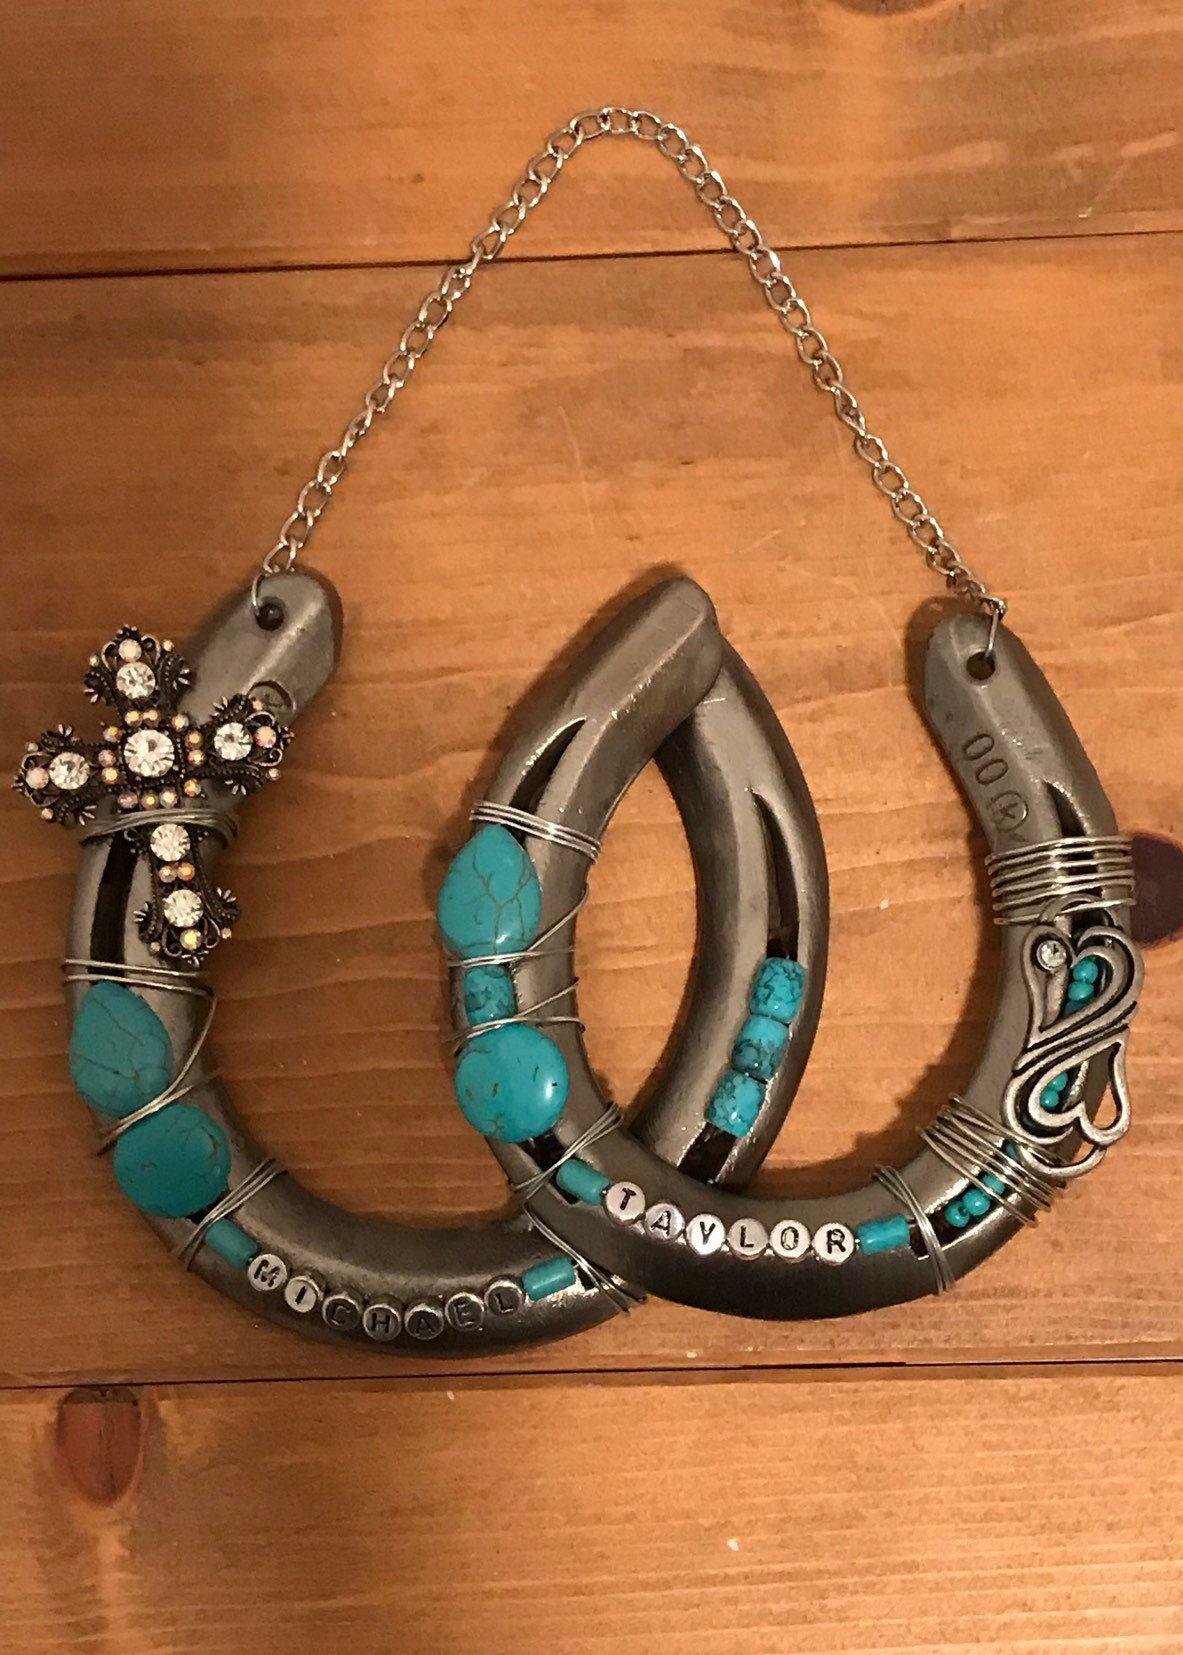 Wedding Gift Decorated Horseshoe Gift For Couple Good Luck